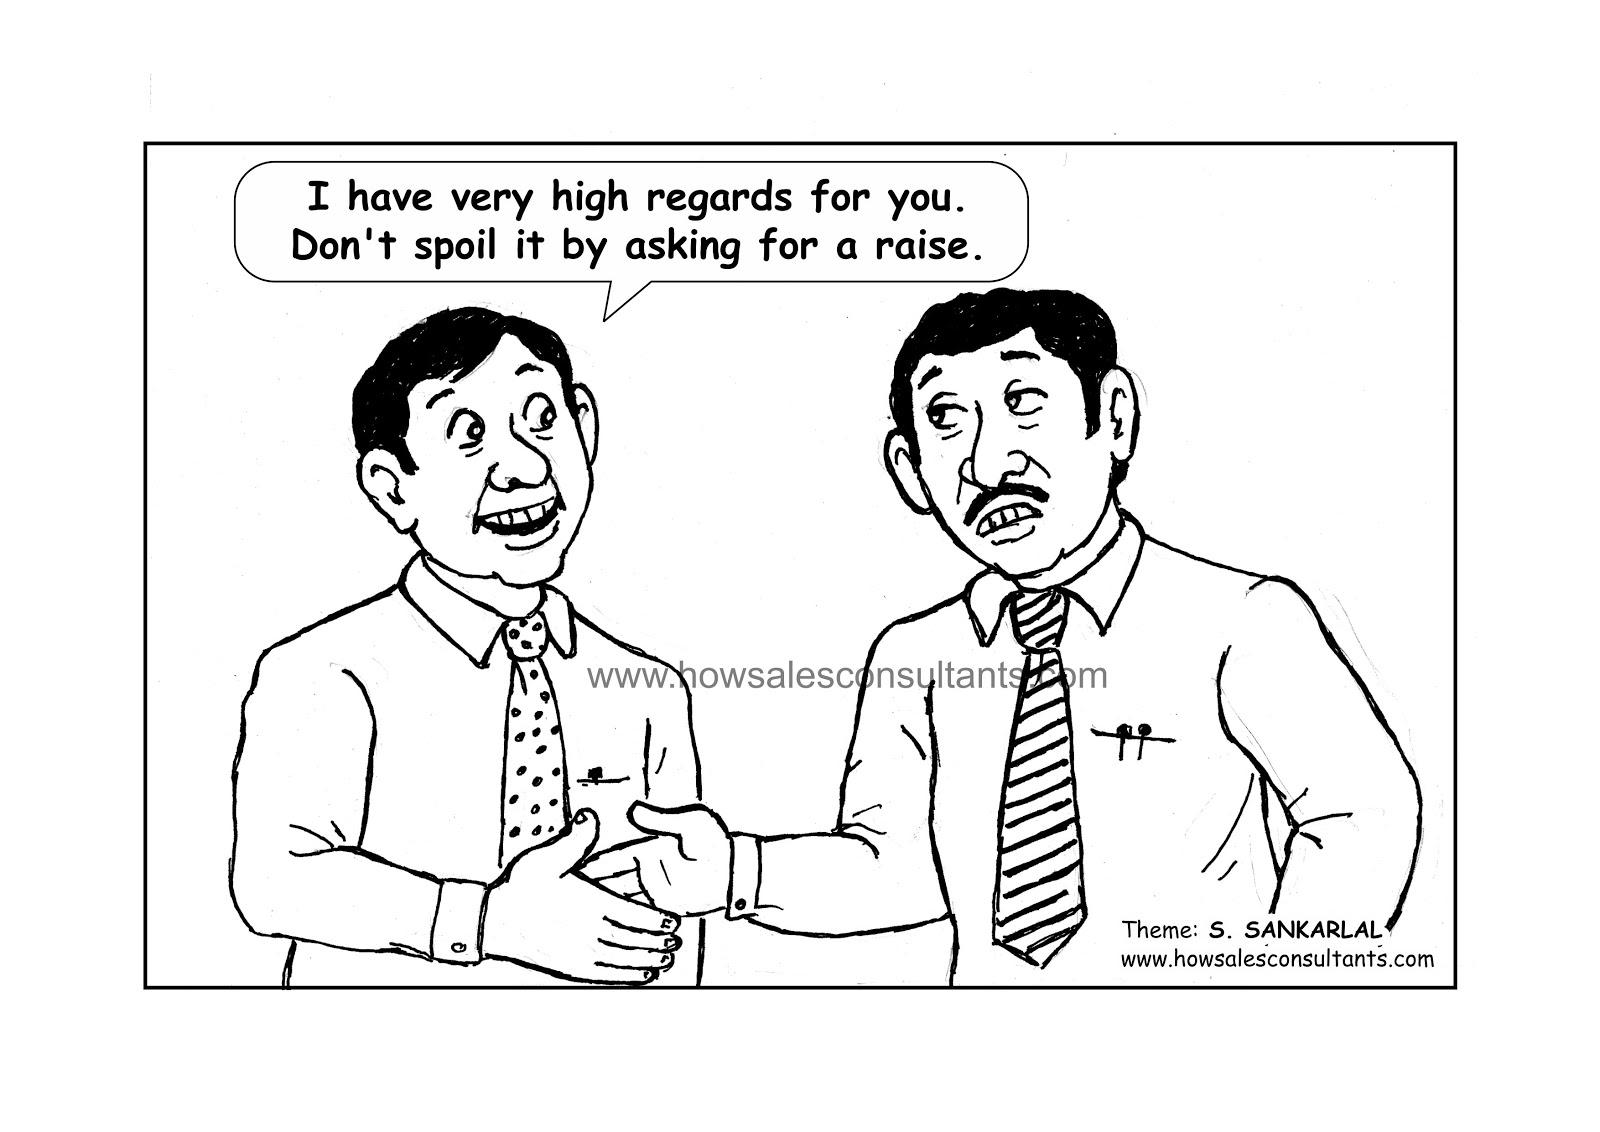 Sankarlal's Cartoons: 03/13